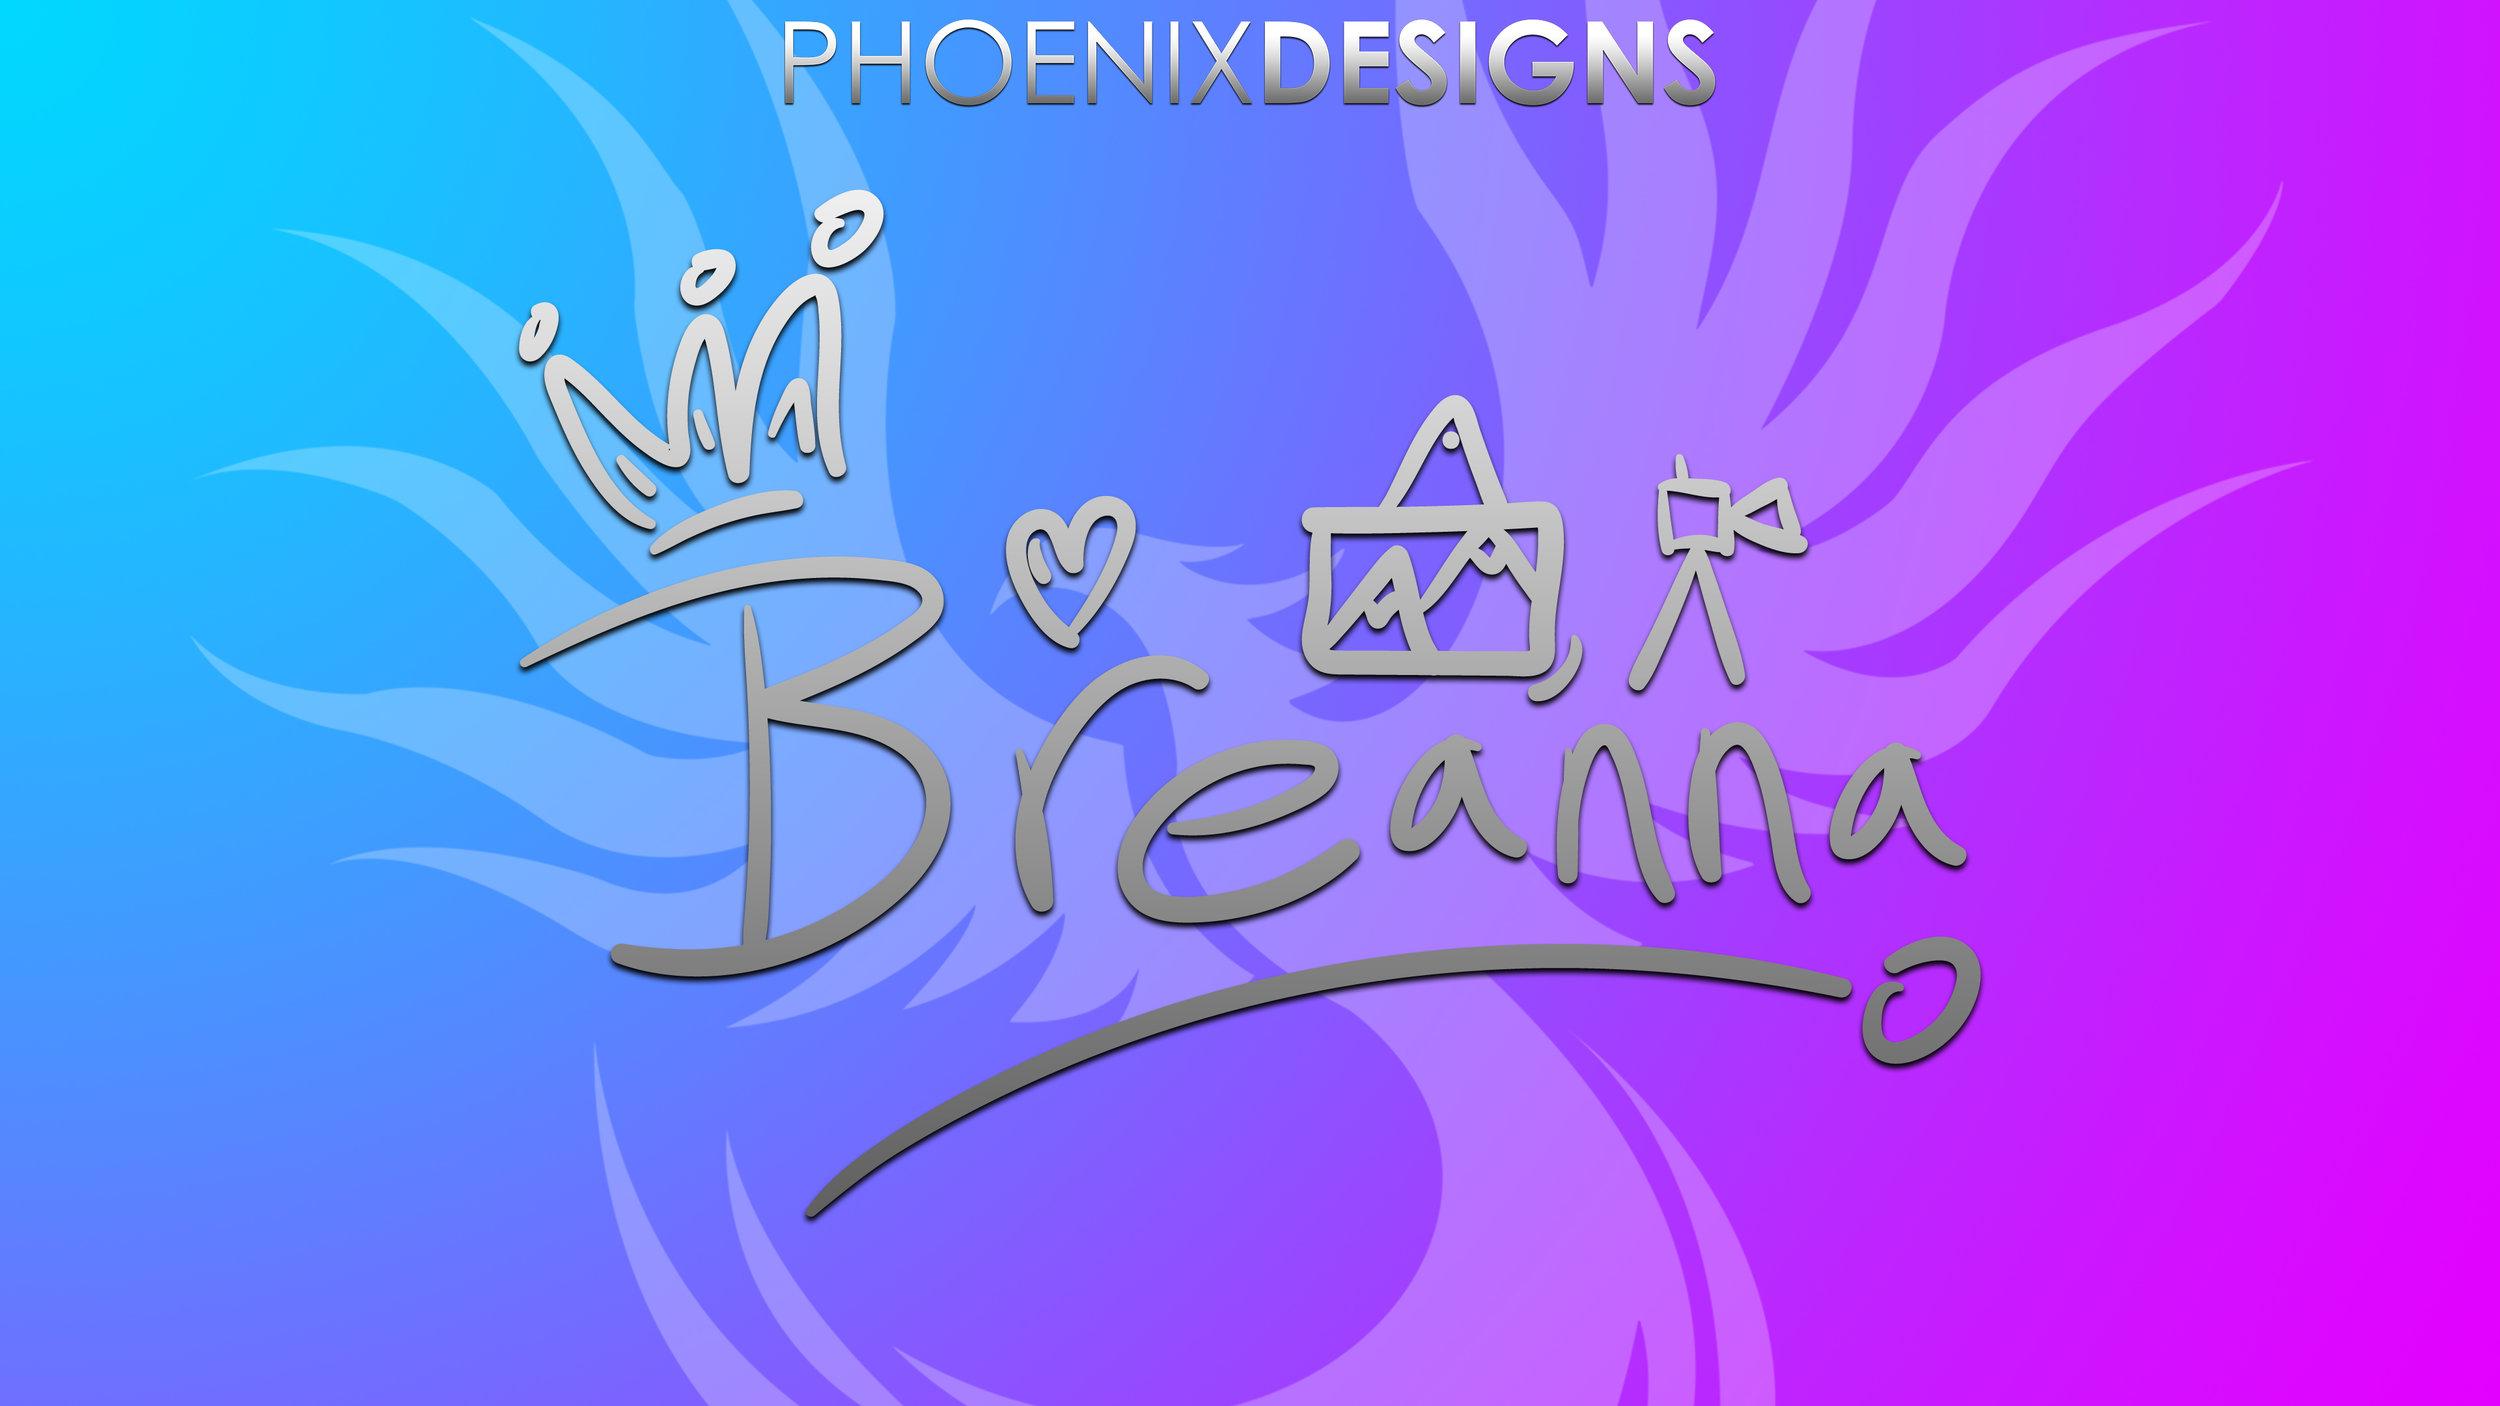 Phoenix - Signature Breanna.jpg